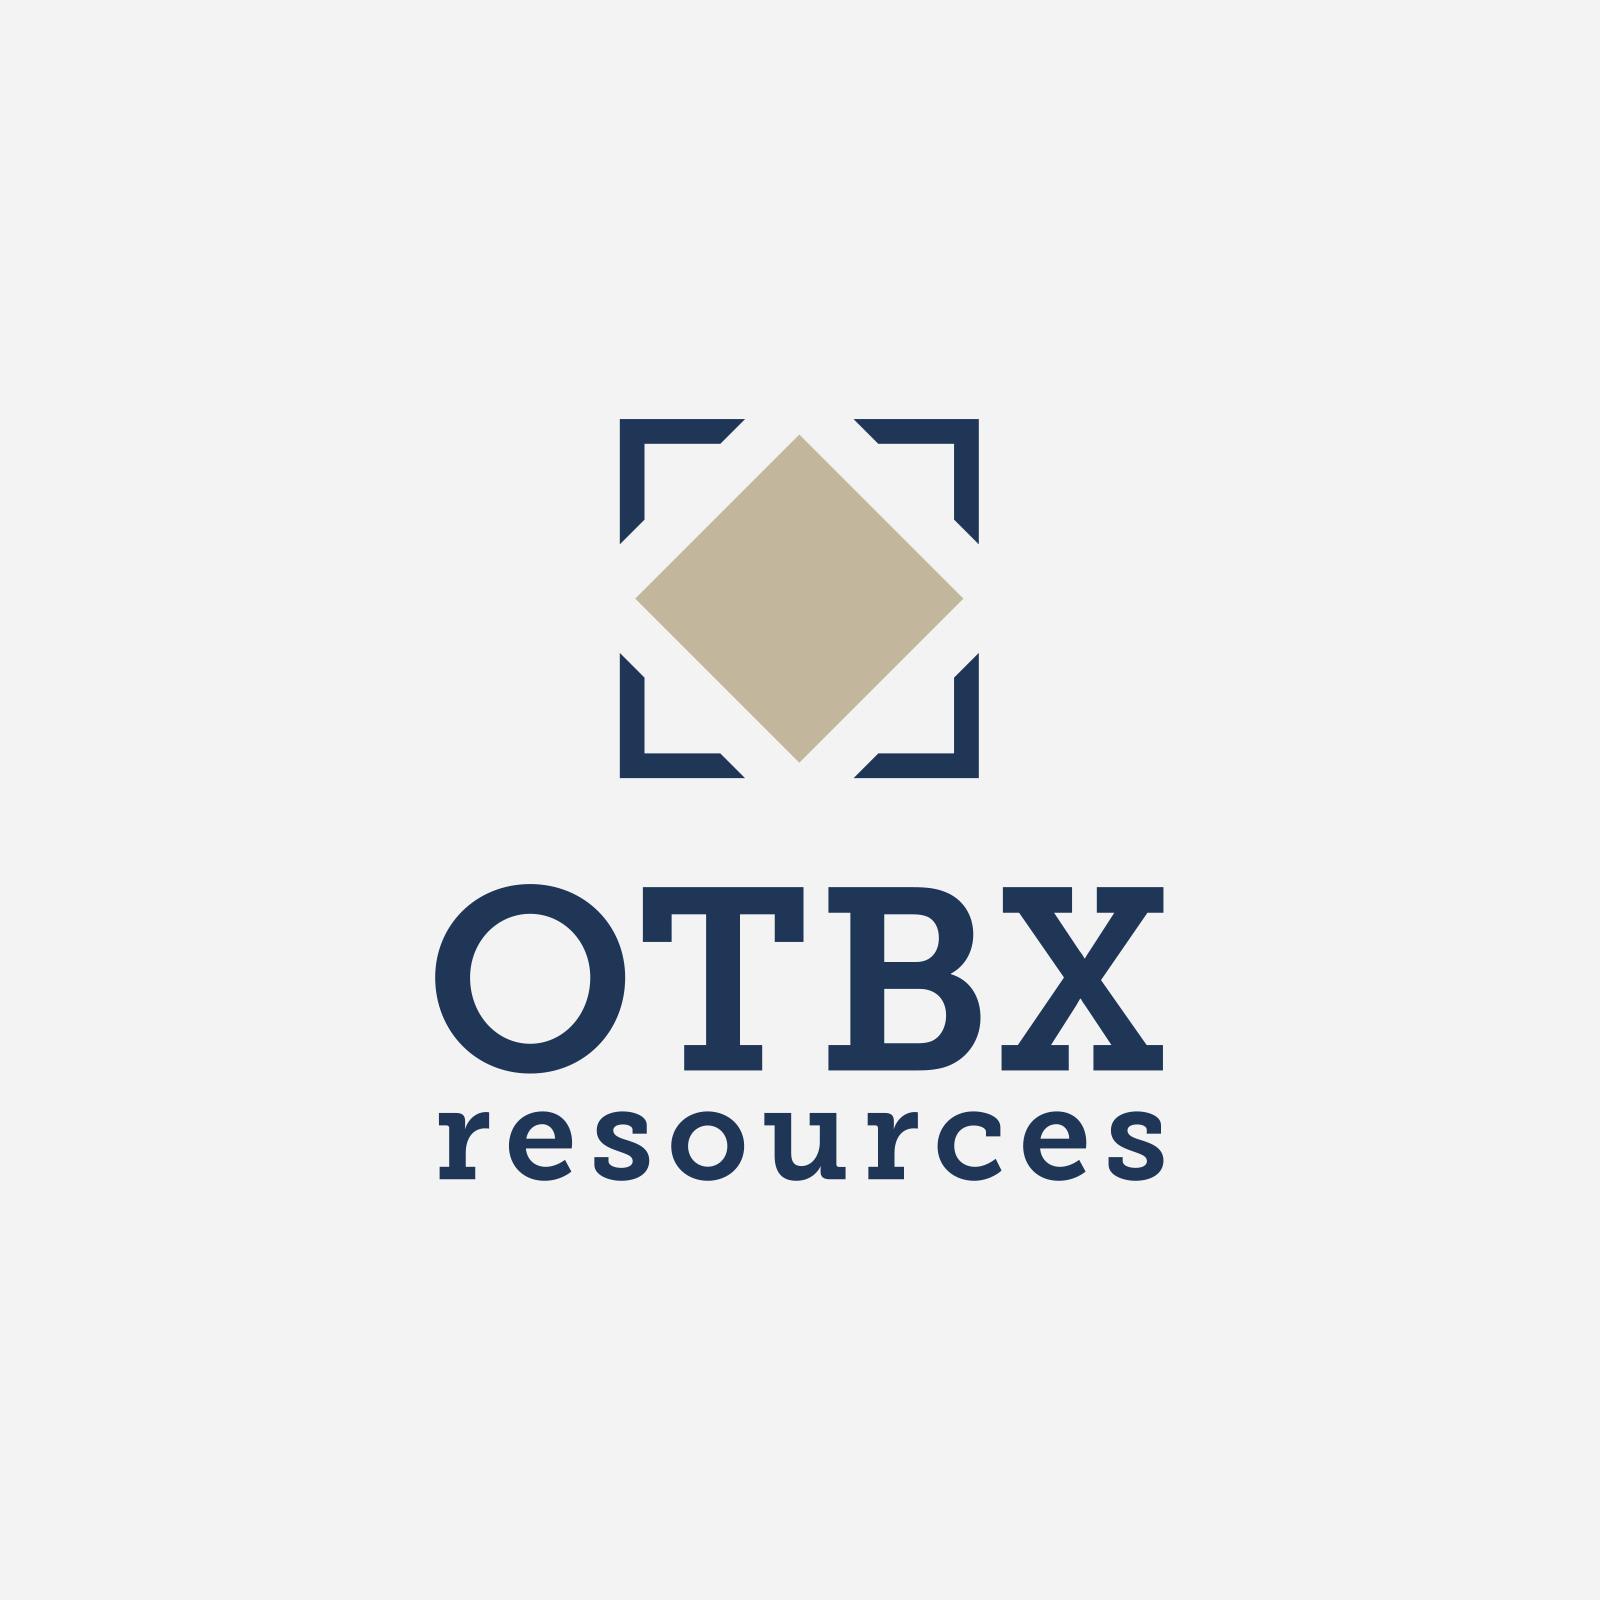 OTBX.jpg